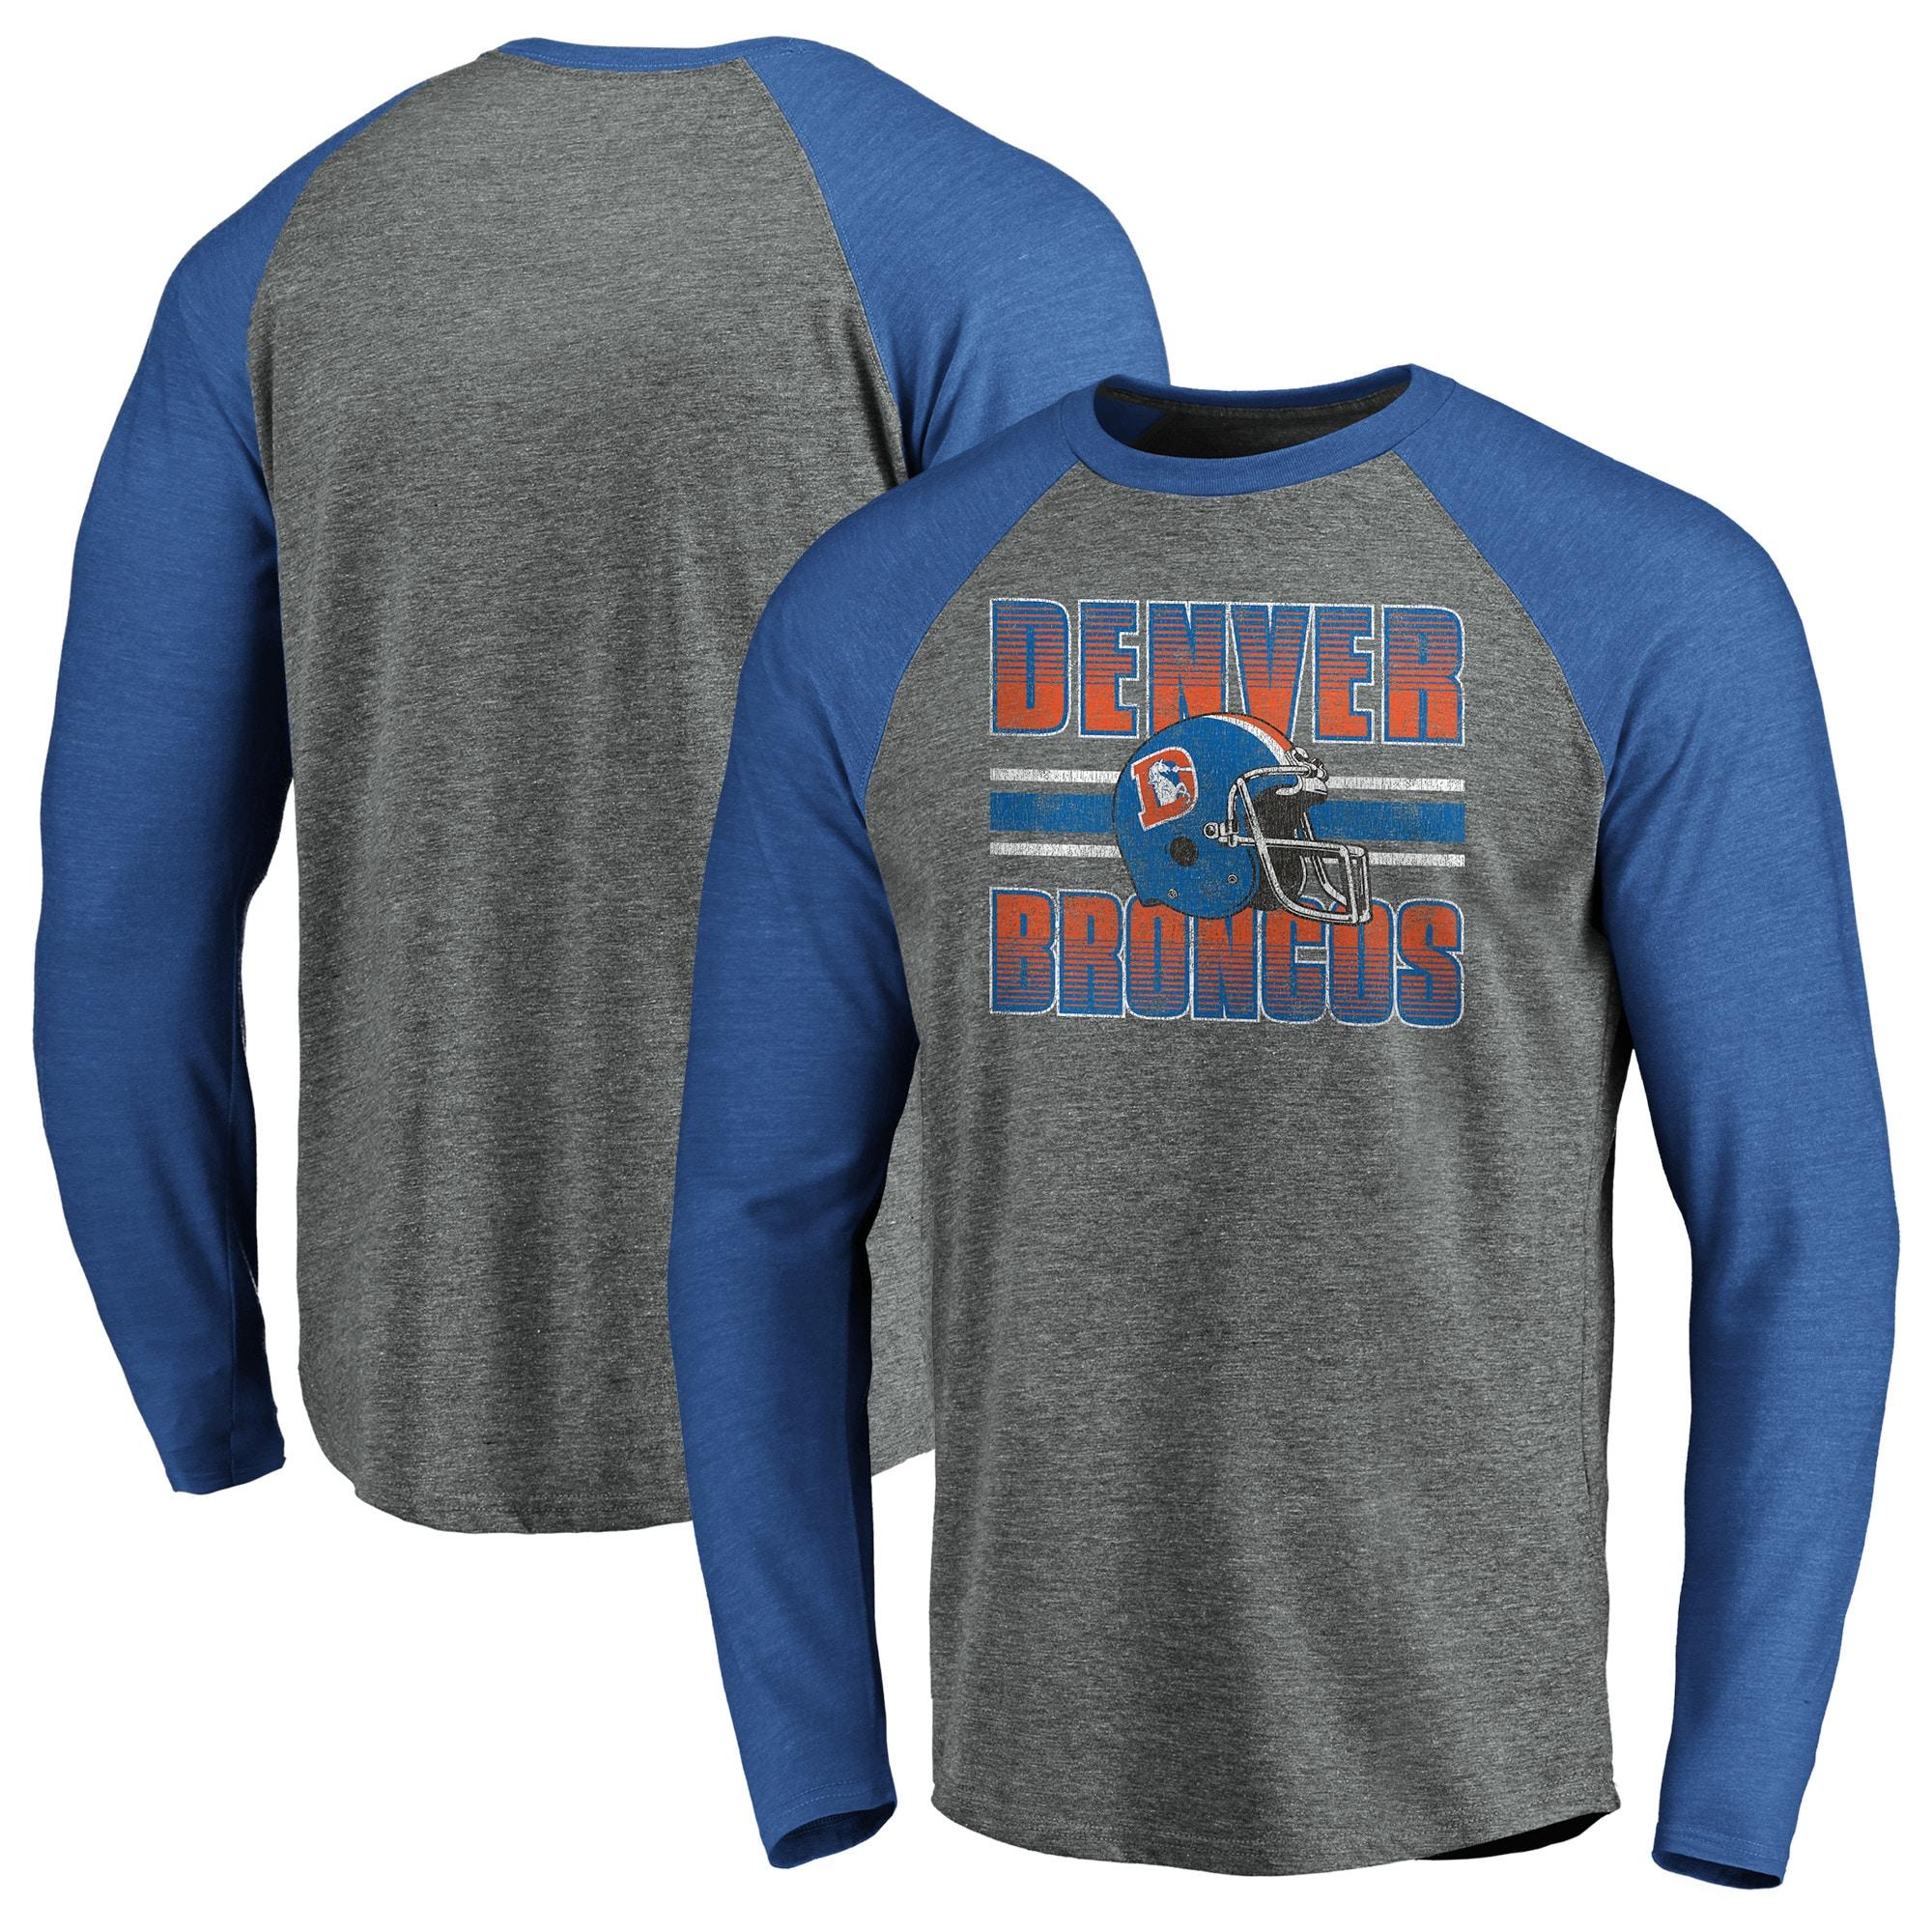 Denver Broncos NFL Pro Line by Fanatics Branded True Classics Stripe Helmet Throwback Tri-Blend Raglan Long Sleeve T-Shirt - Gray/Heathered Royal